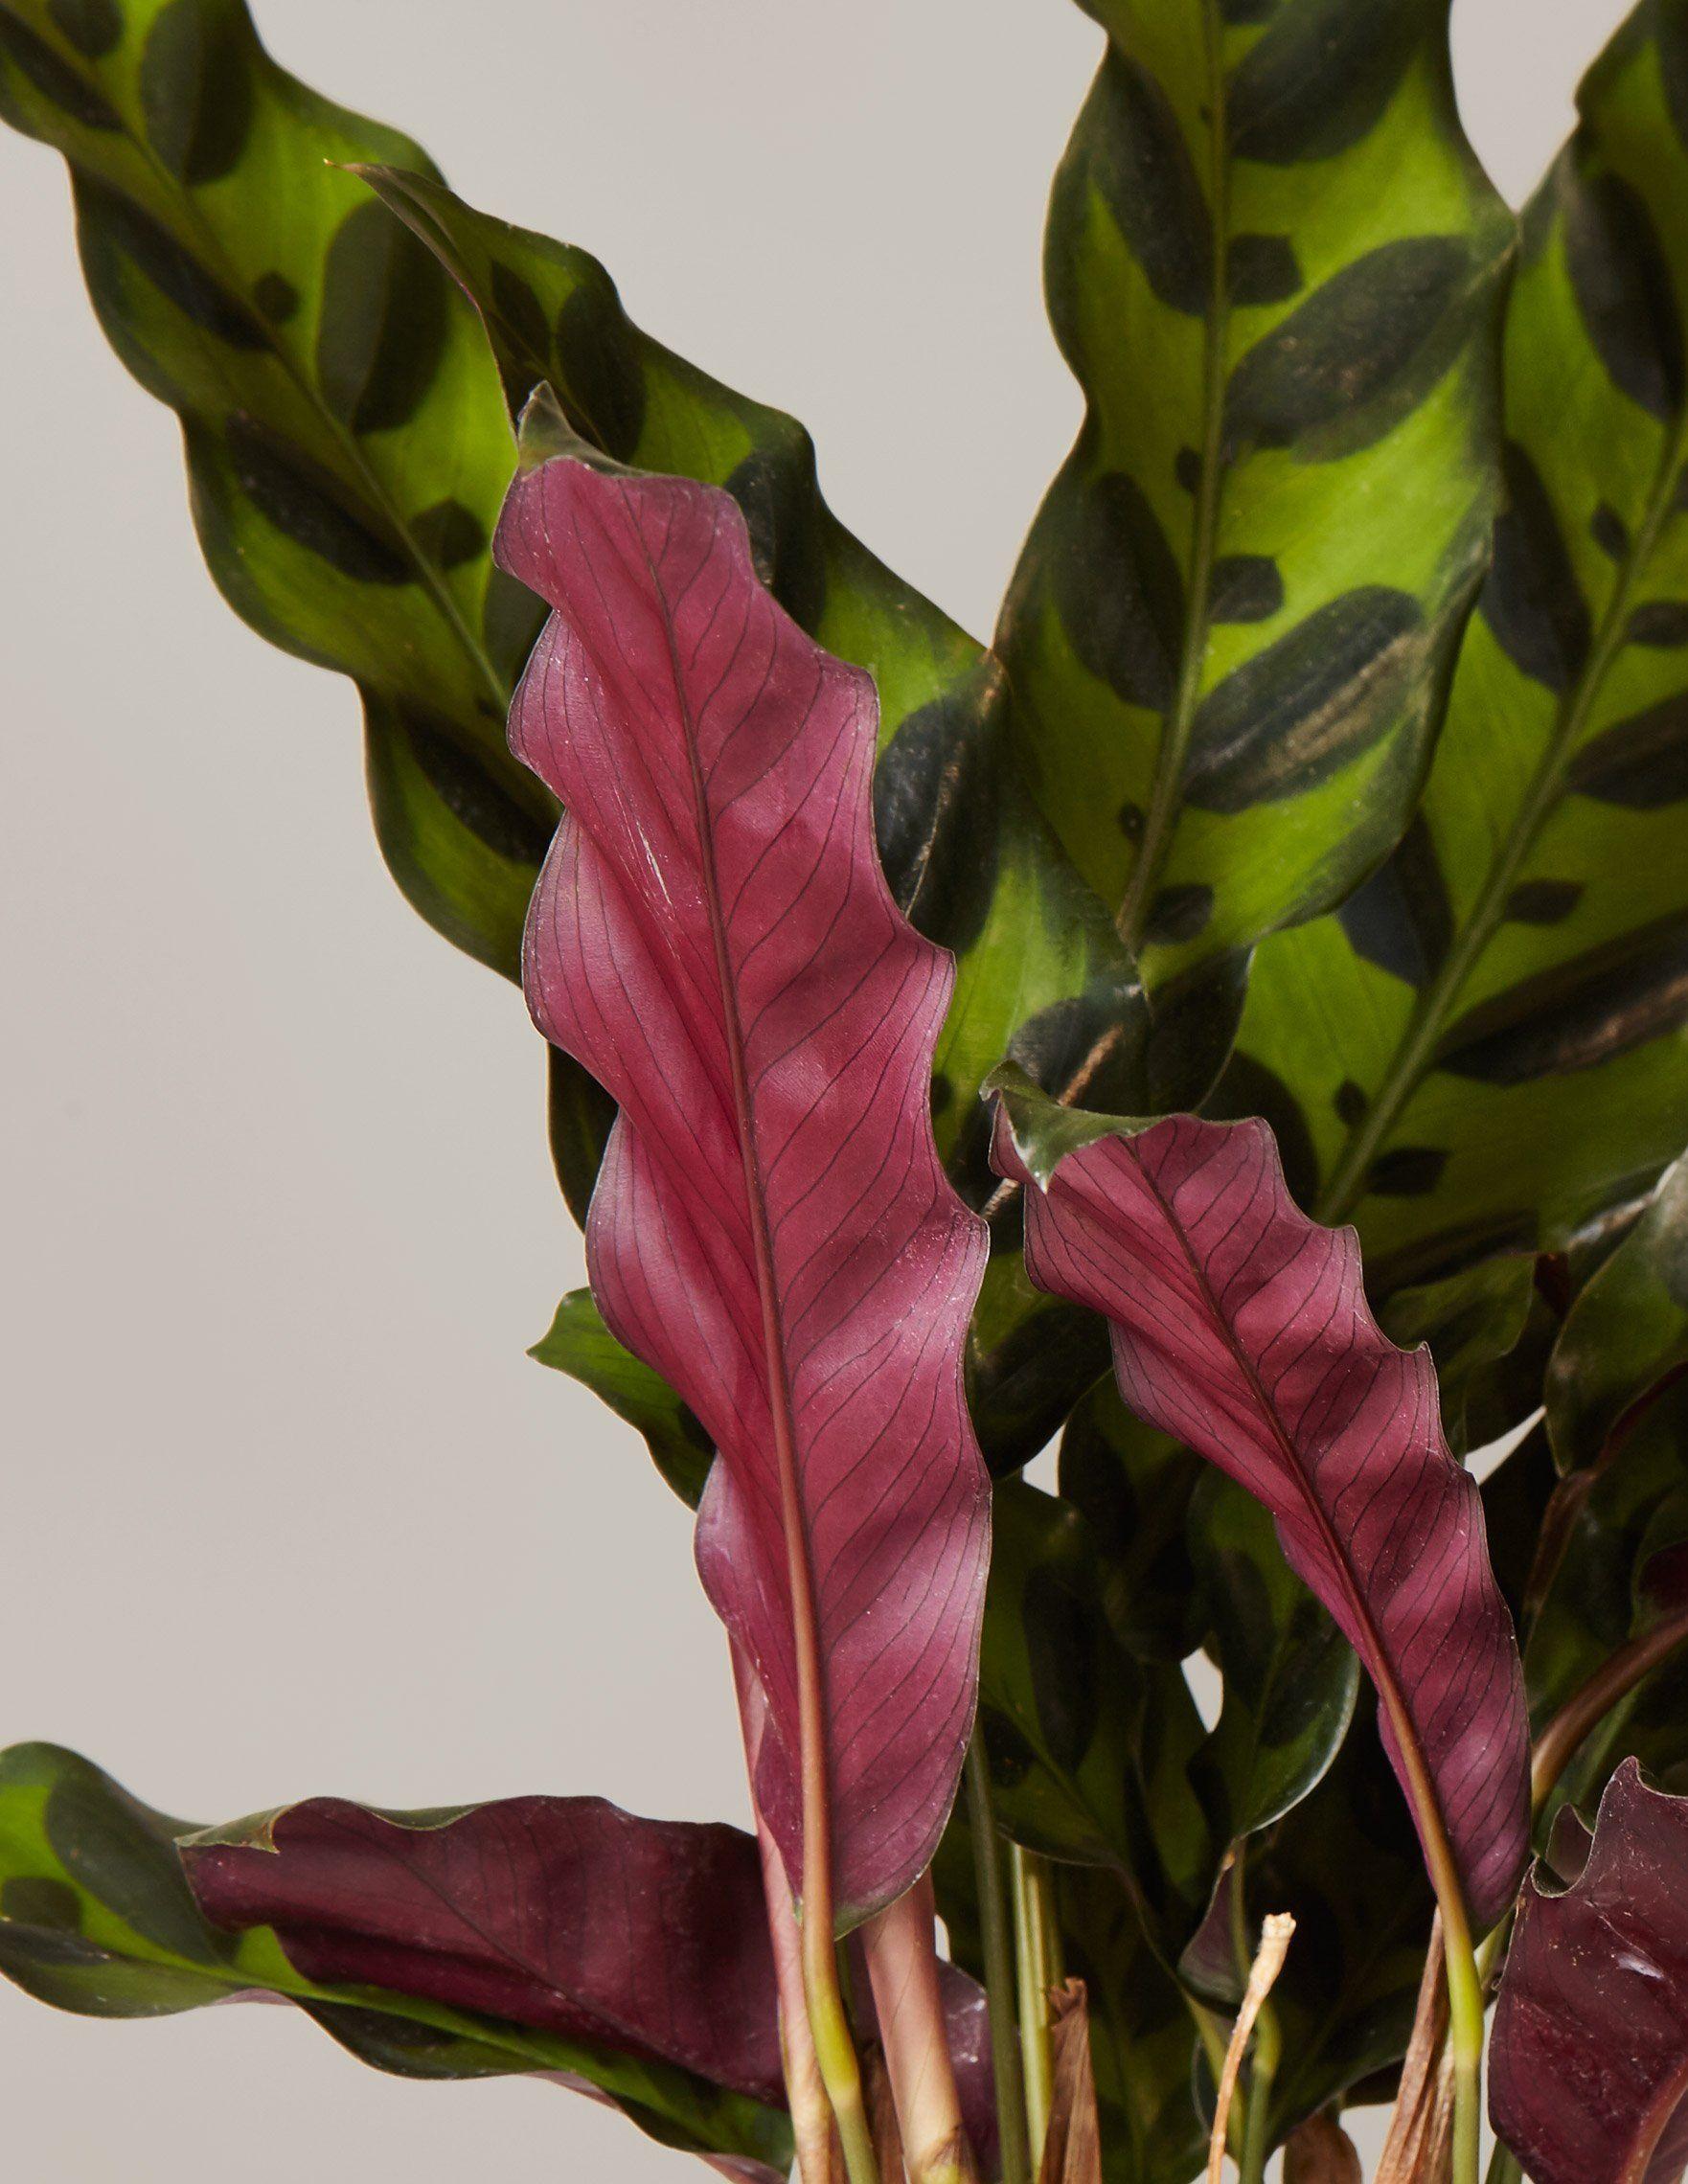 Calathea Rattlesnake | Plants, Unusual plants, Calathea on purple leaf plants with leaf, purple leaf shrub with pink flowers, hydrangea with purple leaves,